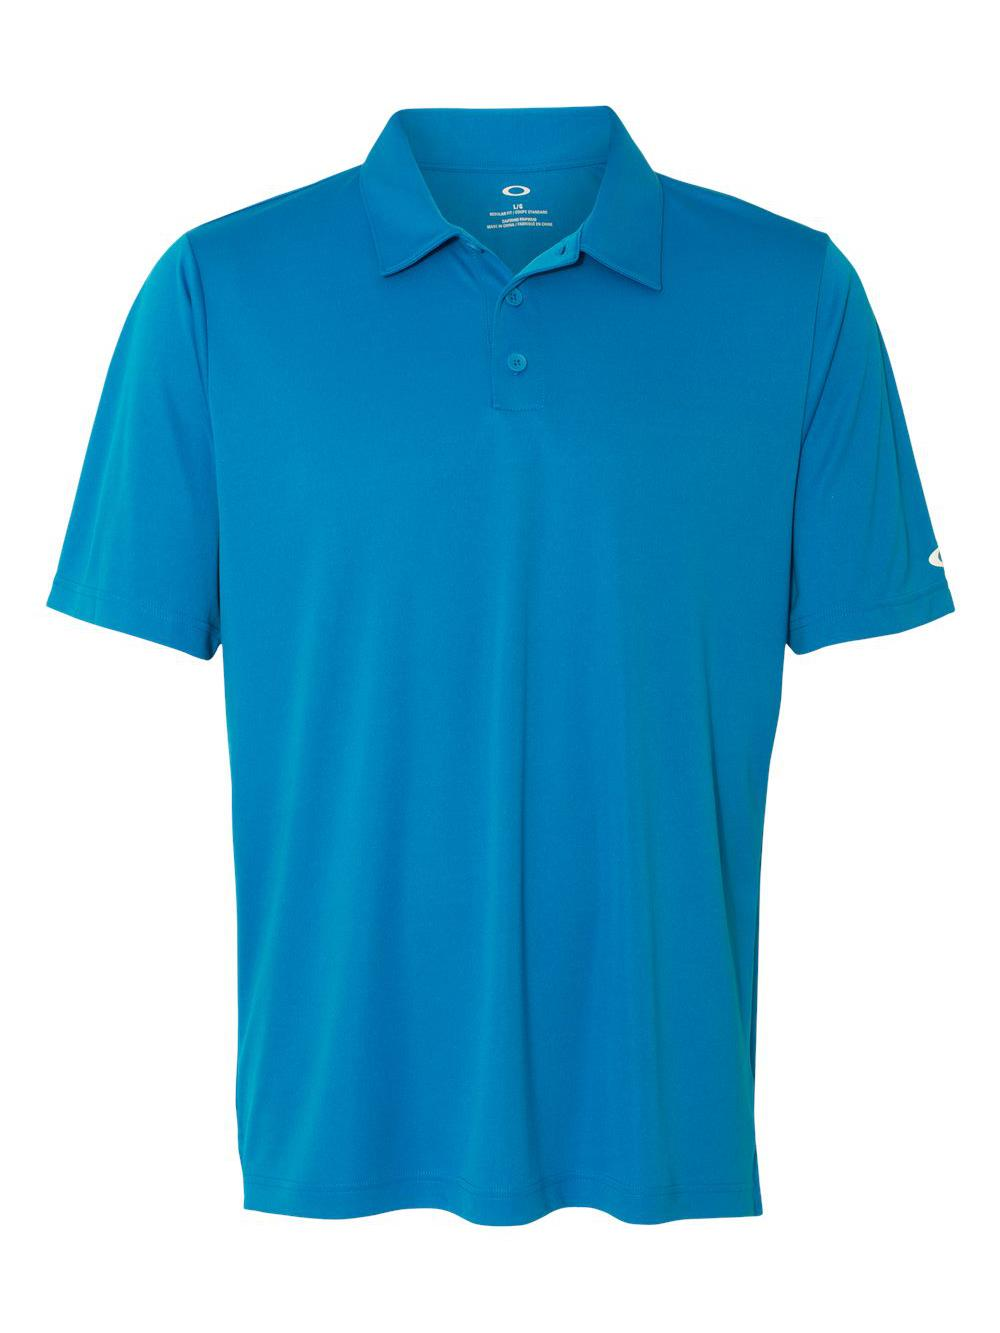 Oakley-Performance-Sport-Shirt-433979ODM thumbnail 9